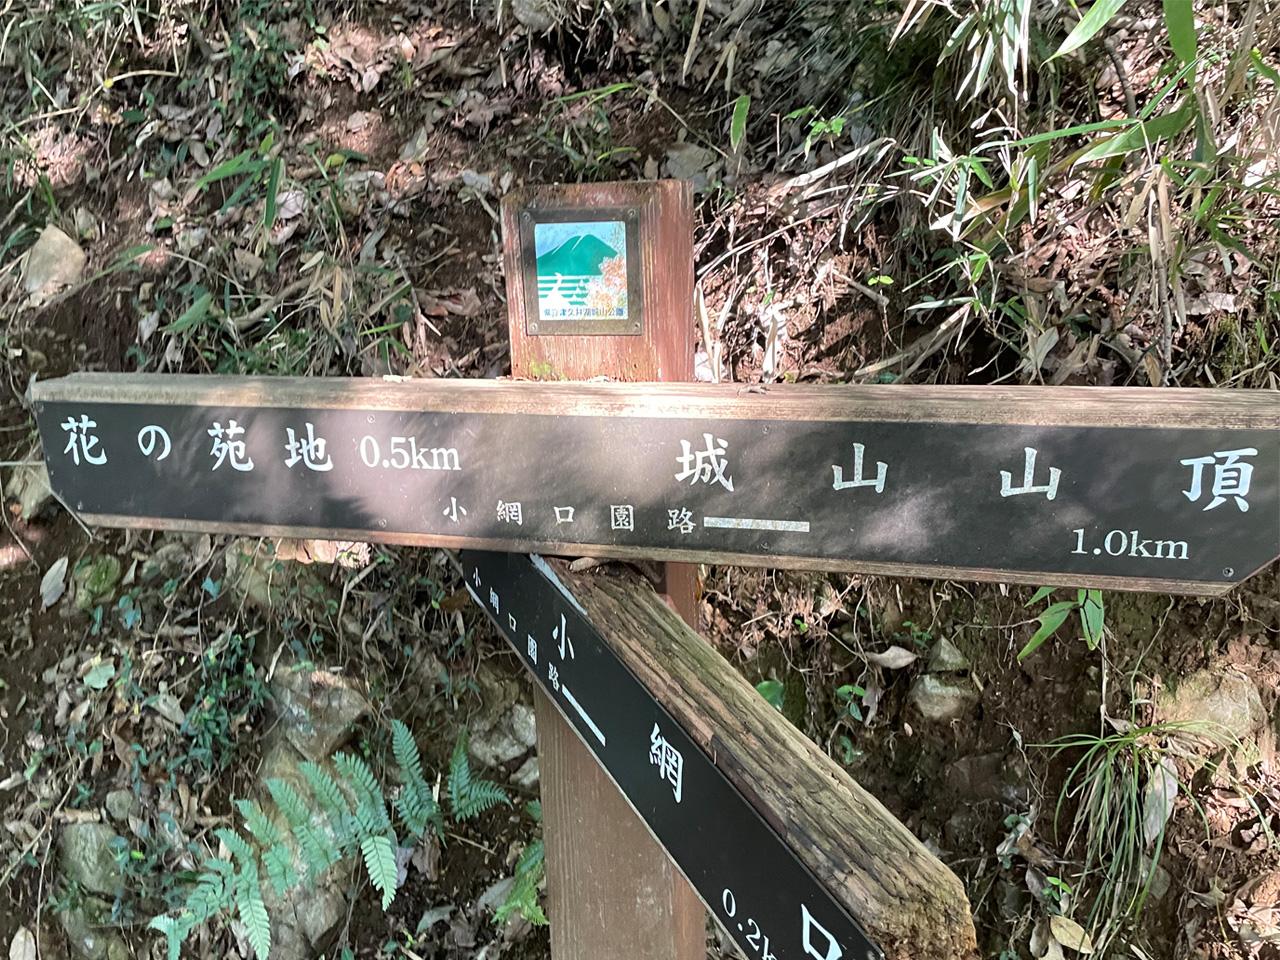 津久井城山山道の案内板